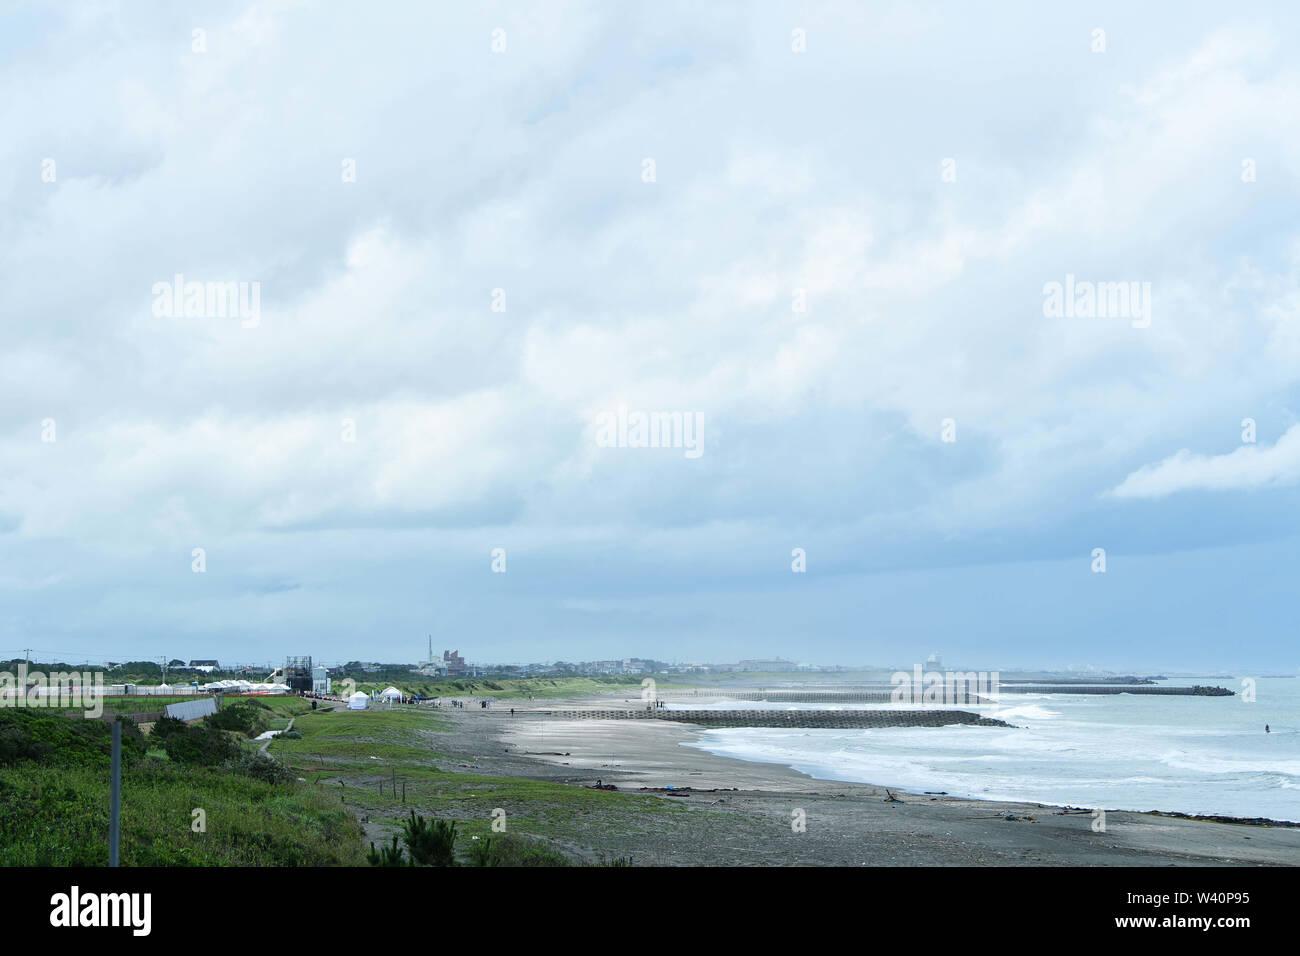 General view, JLUY 17, 2019 - Surfing : READY STEADY TOKYO - Surfing at Ichinomiya Shida Shita Point, Tsurigasaki beach in Chiba, Japan. Credit: MATSUO.K/AFLO SPORT/Alamy Live News - Stock Image